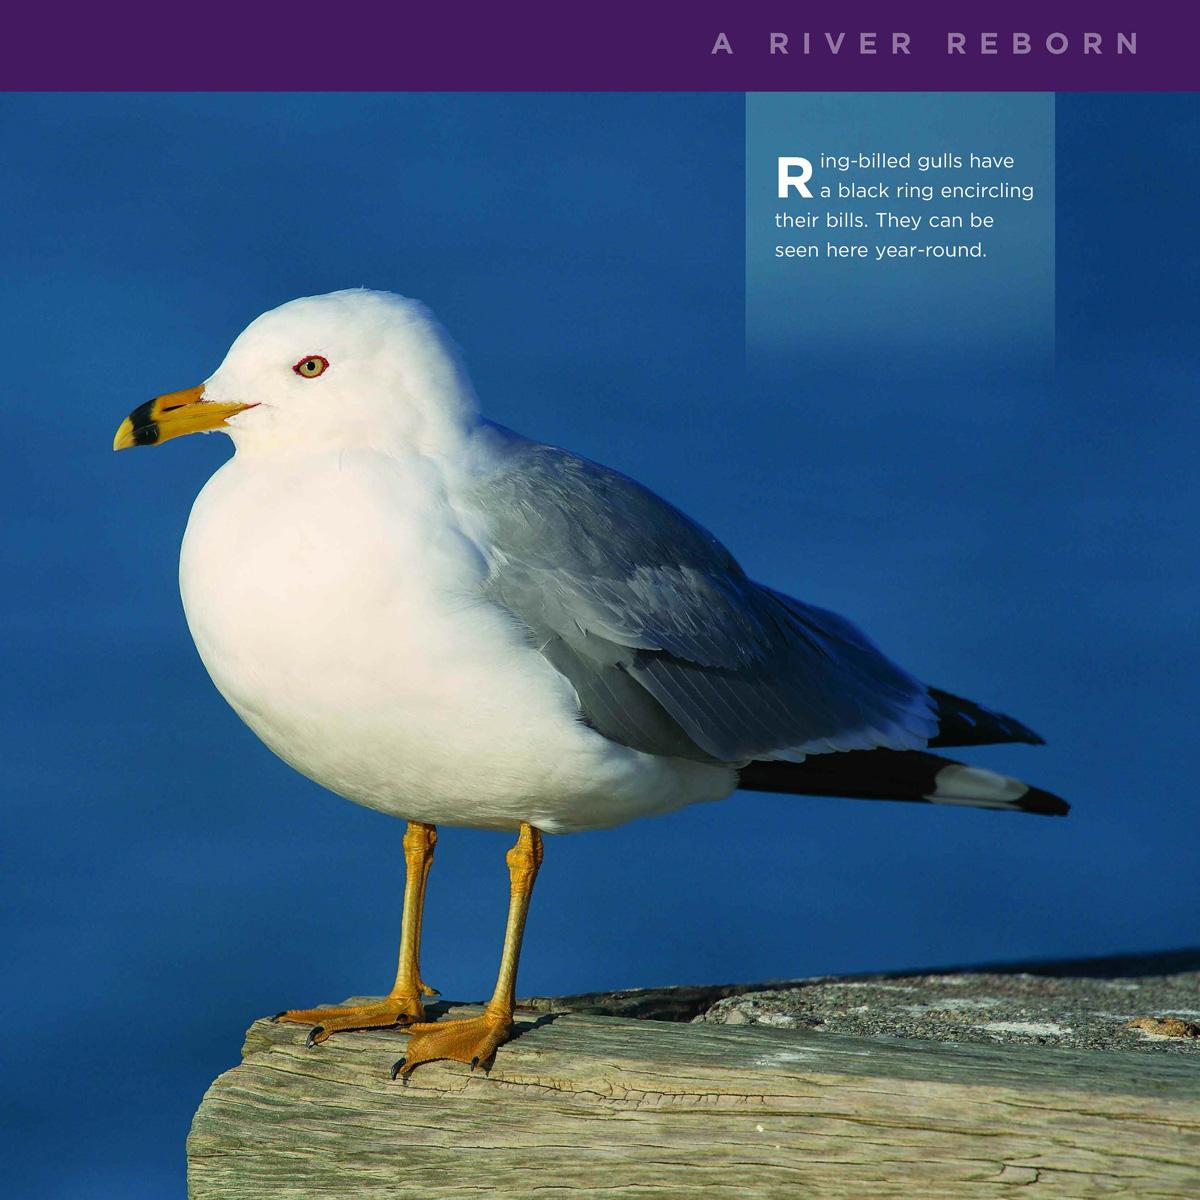 red-billed-gulls